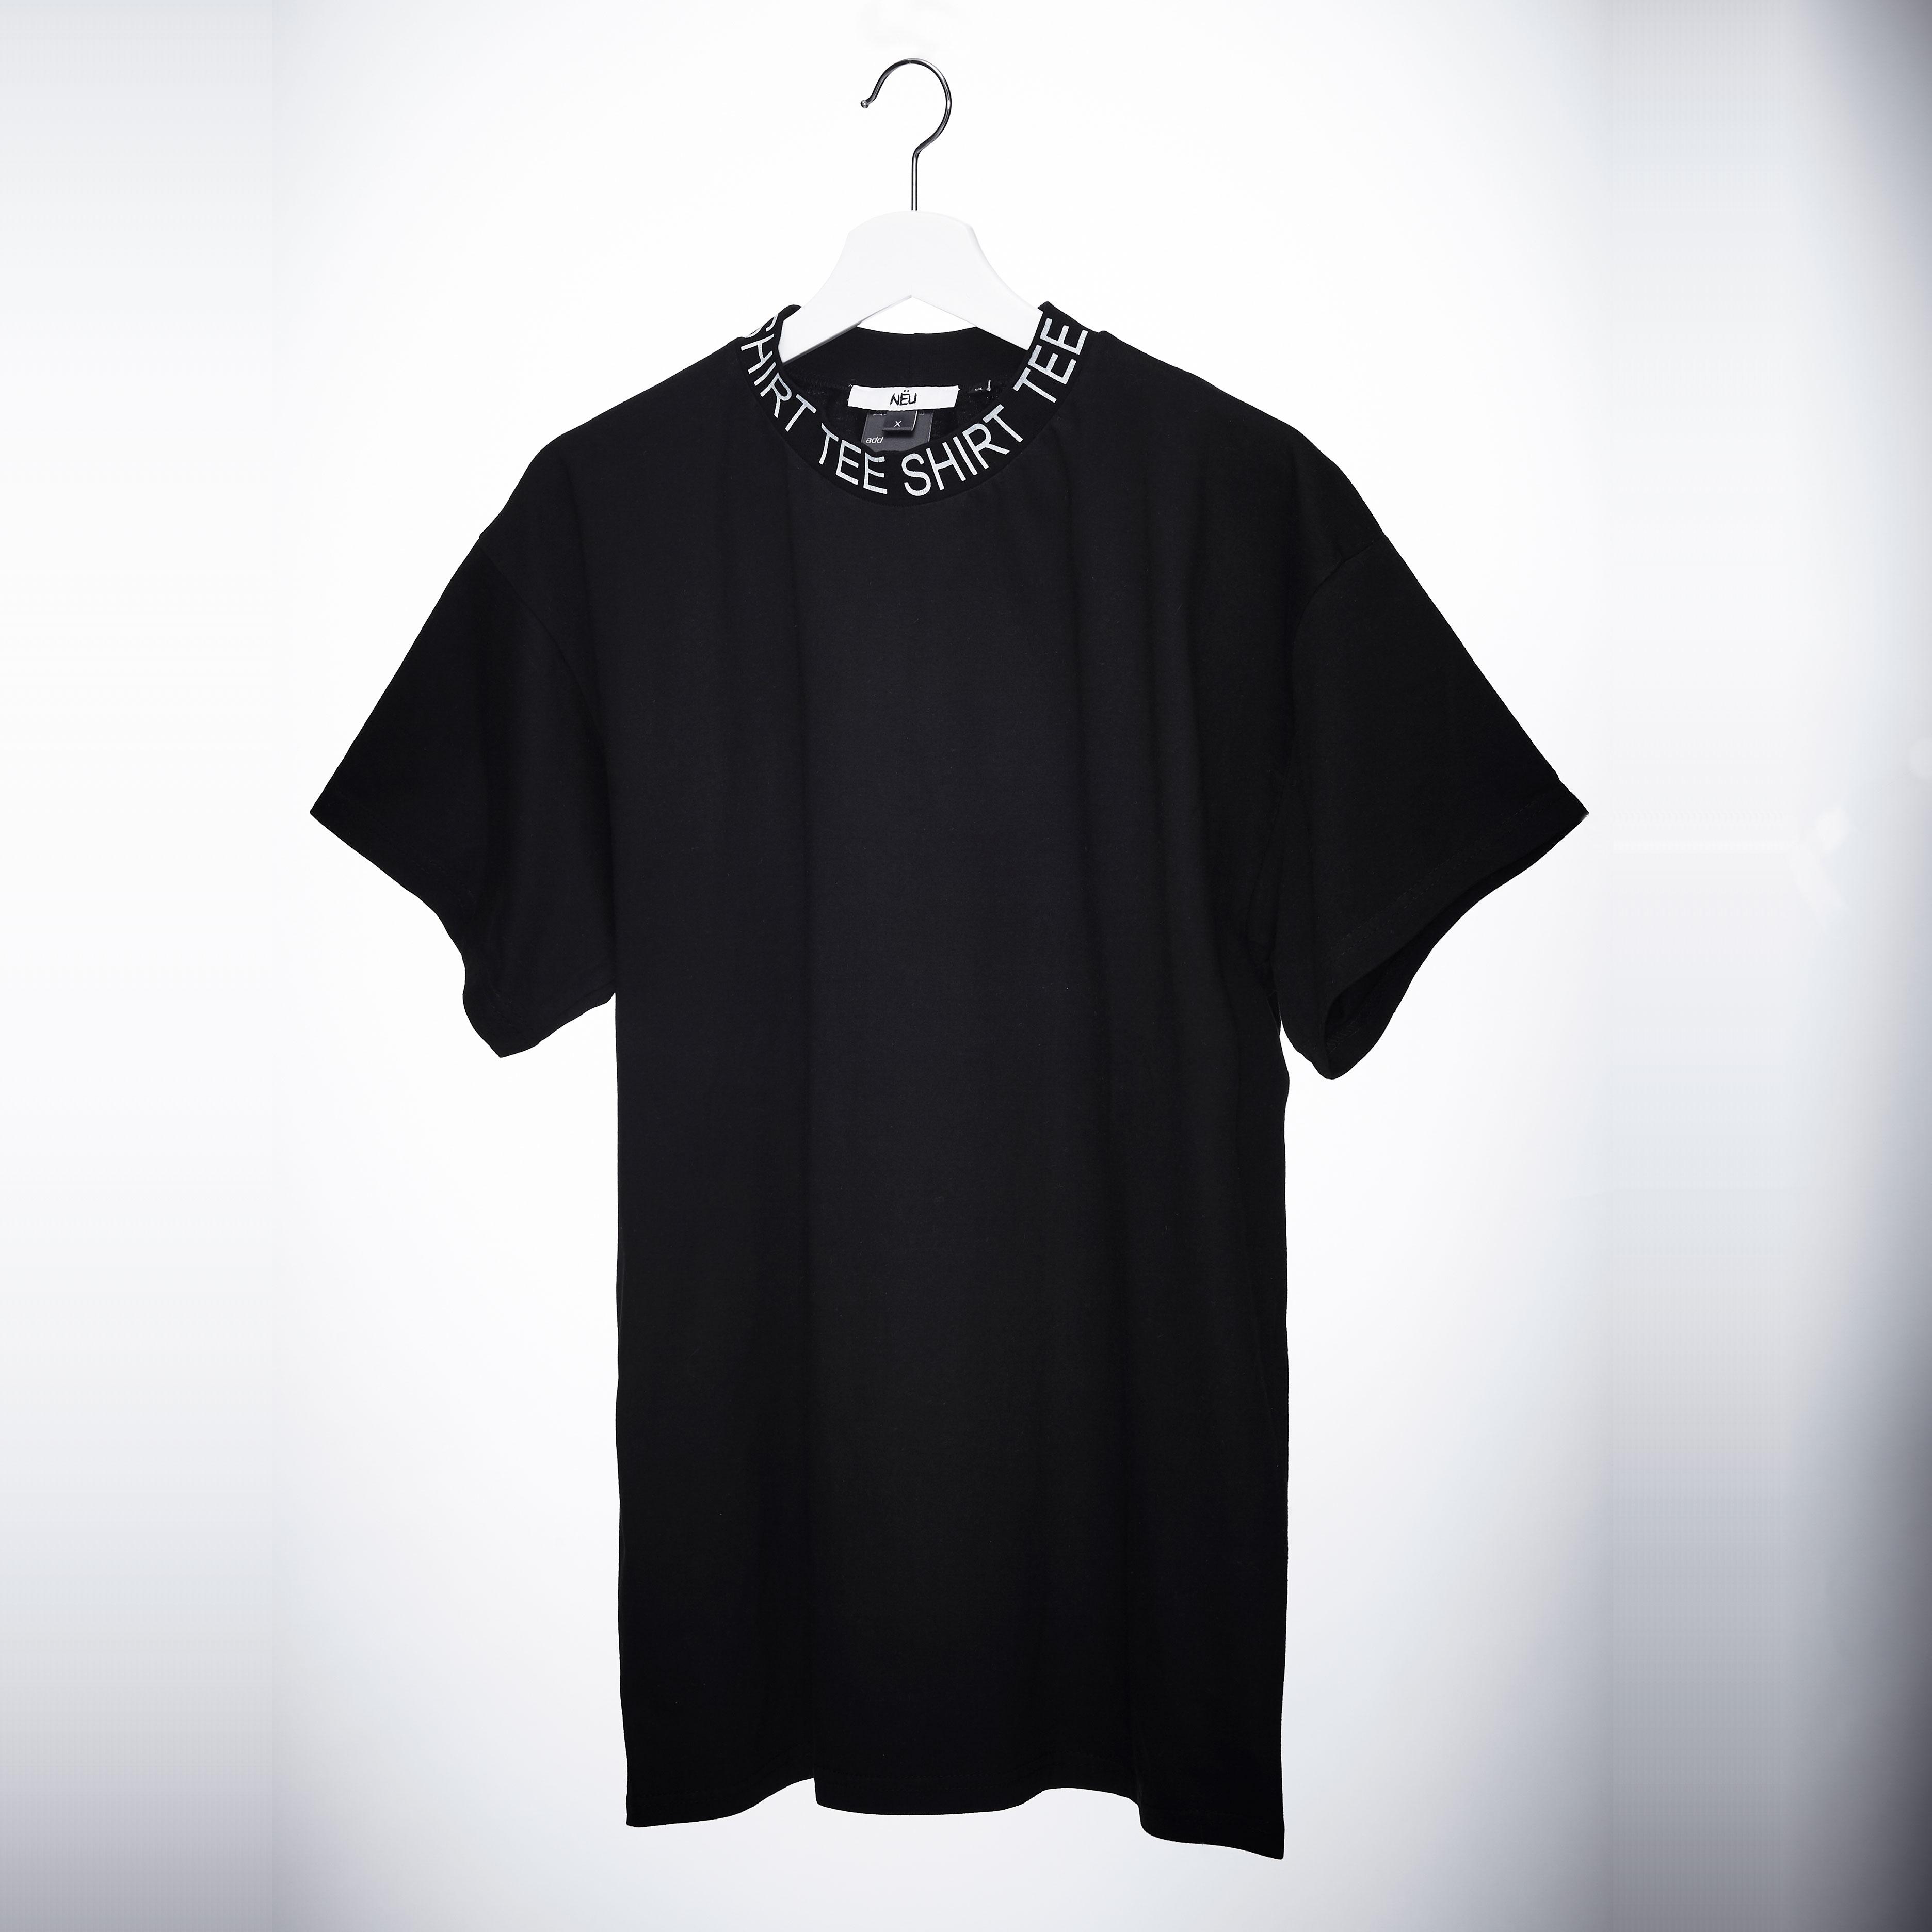 the tee-shirt